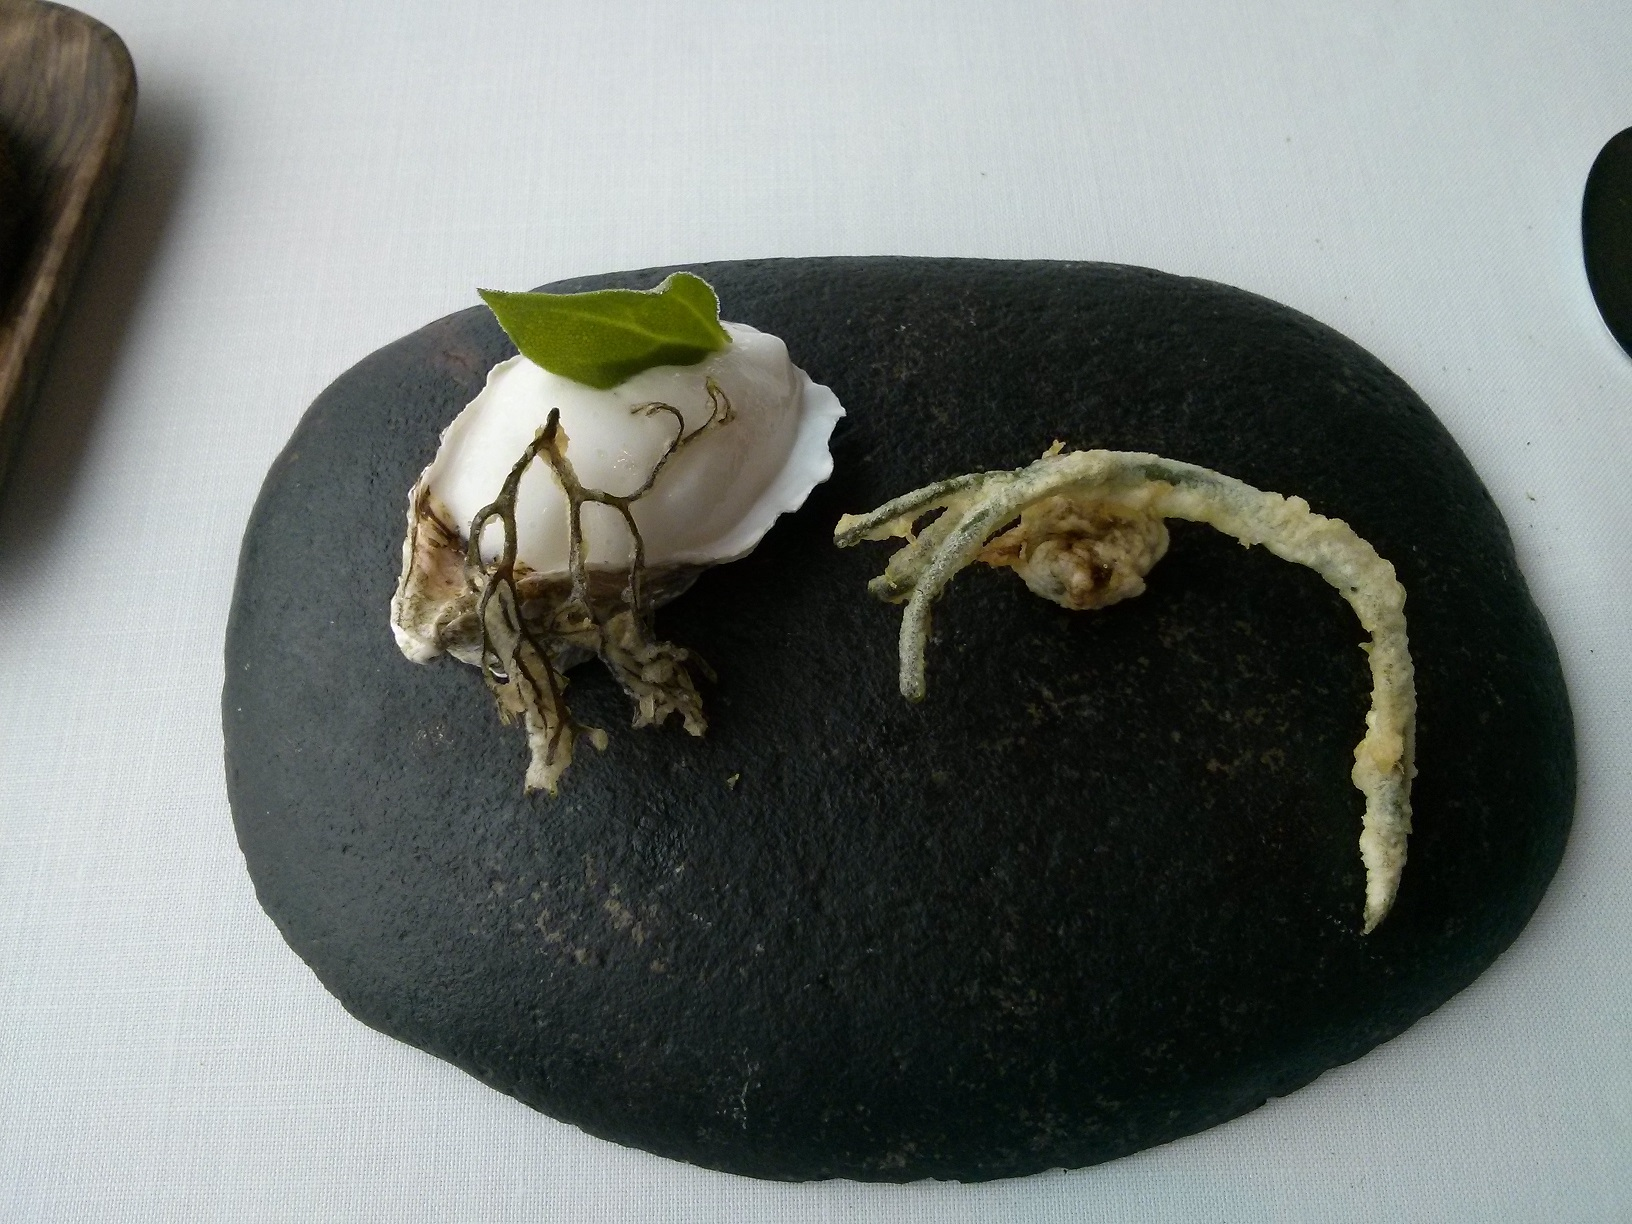 Azurmendi (Vizcaya/Bizkaia) Ostra al pil-pil vegetal y marino acompañado de ortiguillas